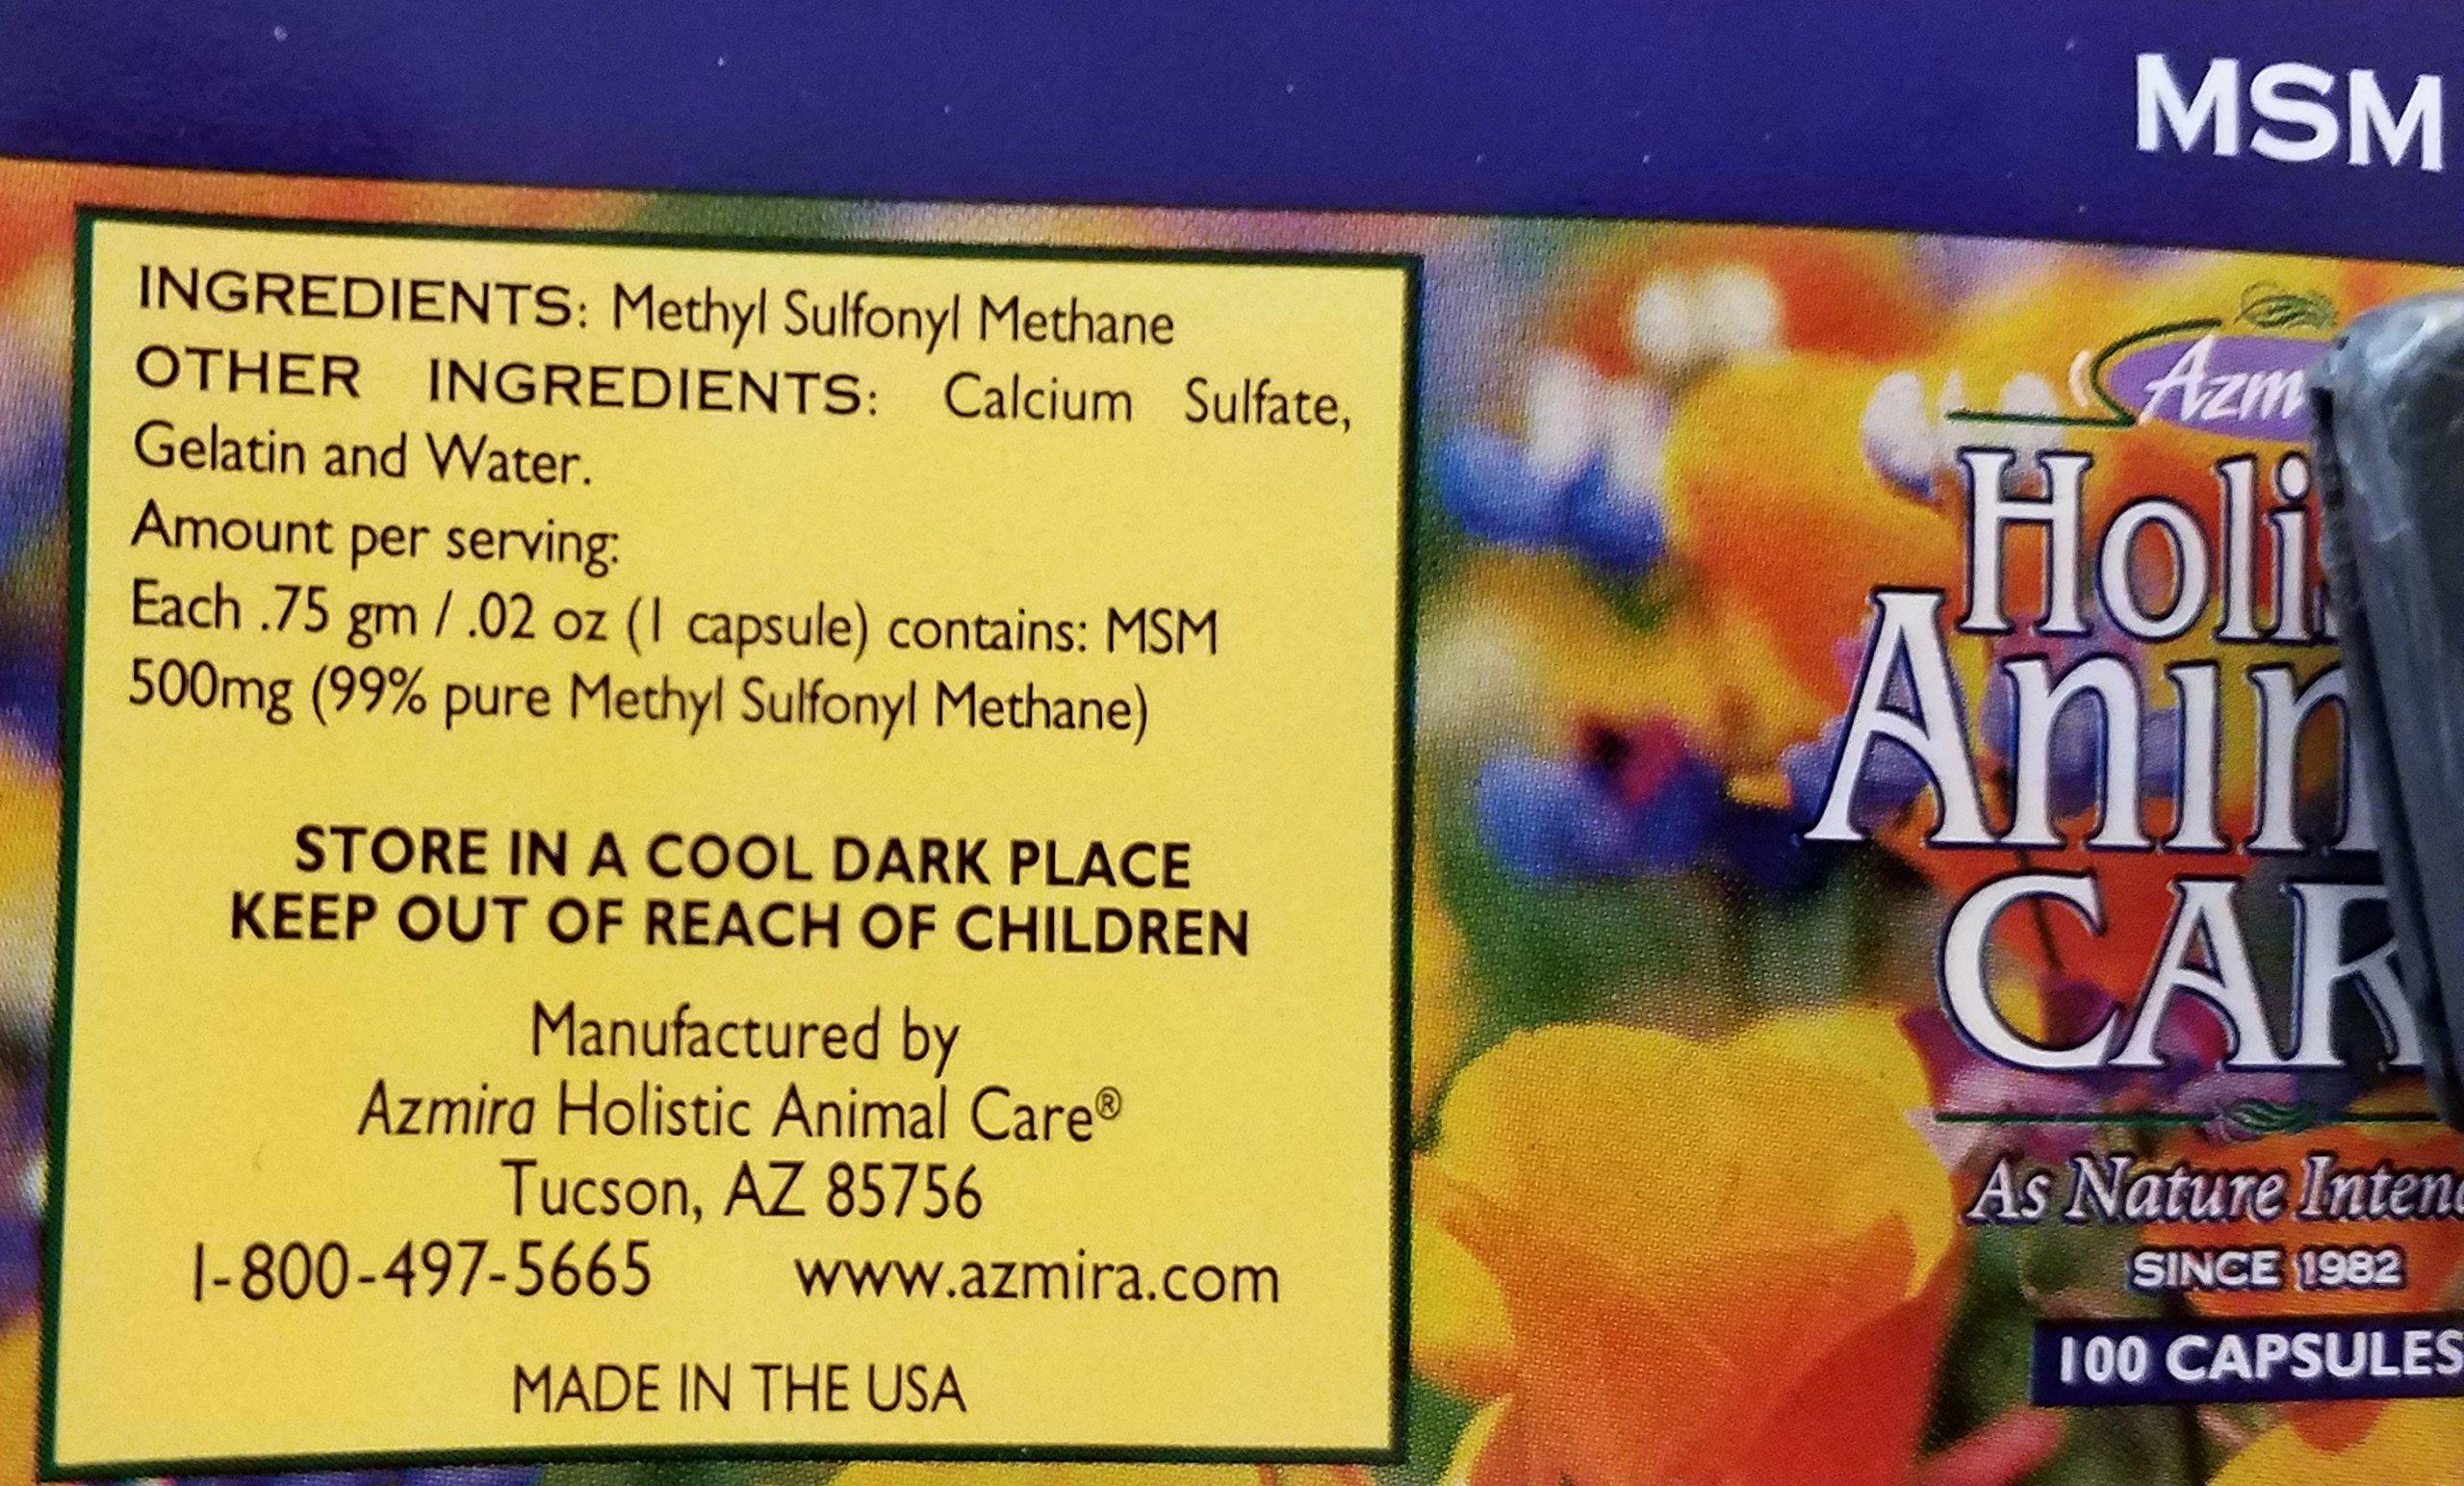 Azmira MSM holistic animal care 100 capsules by Azmira (Image #1)